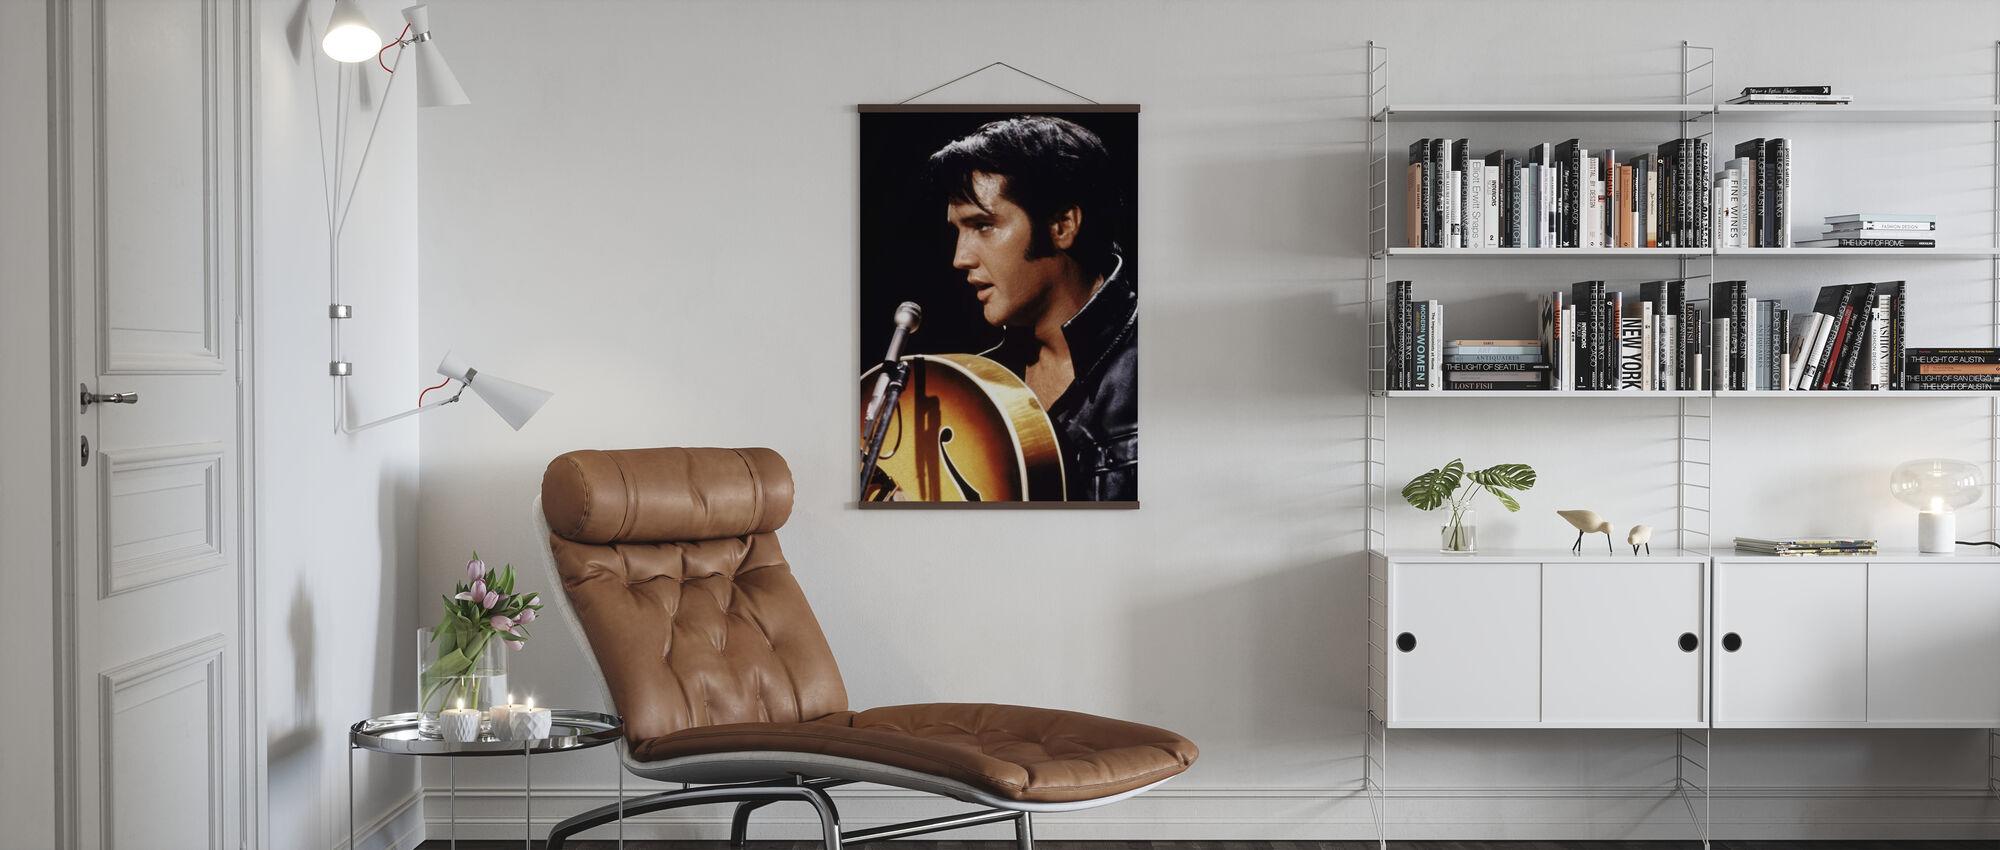 Elvis - Poster - Living Room